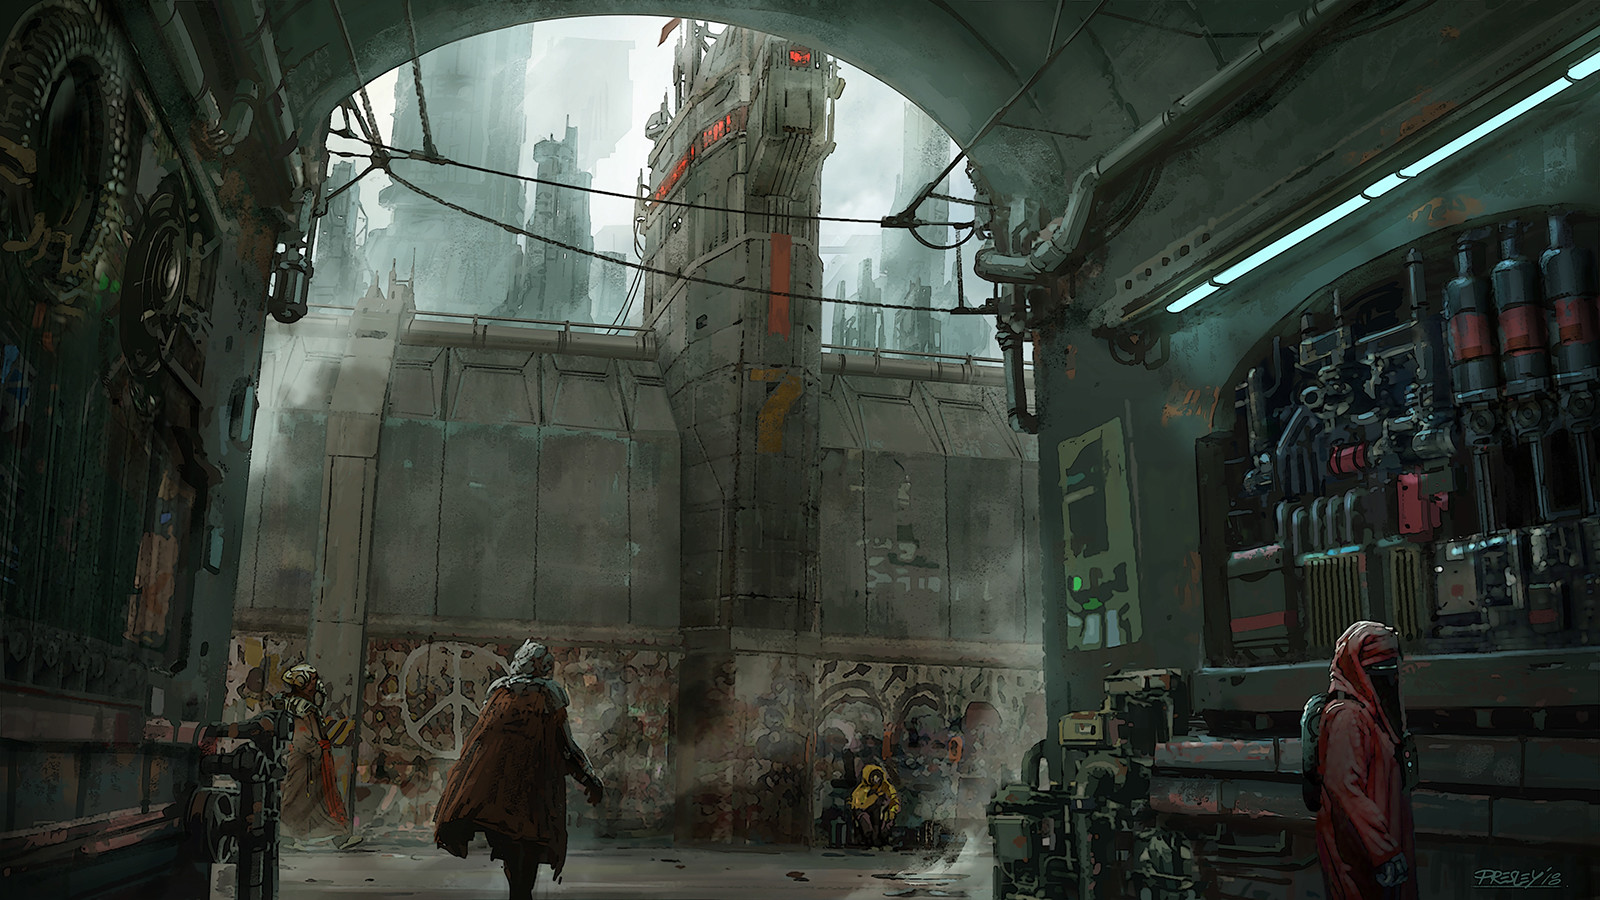 Pat presley berlin sketch repaint v03a thewatchtower